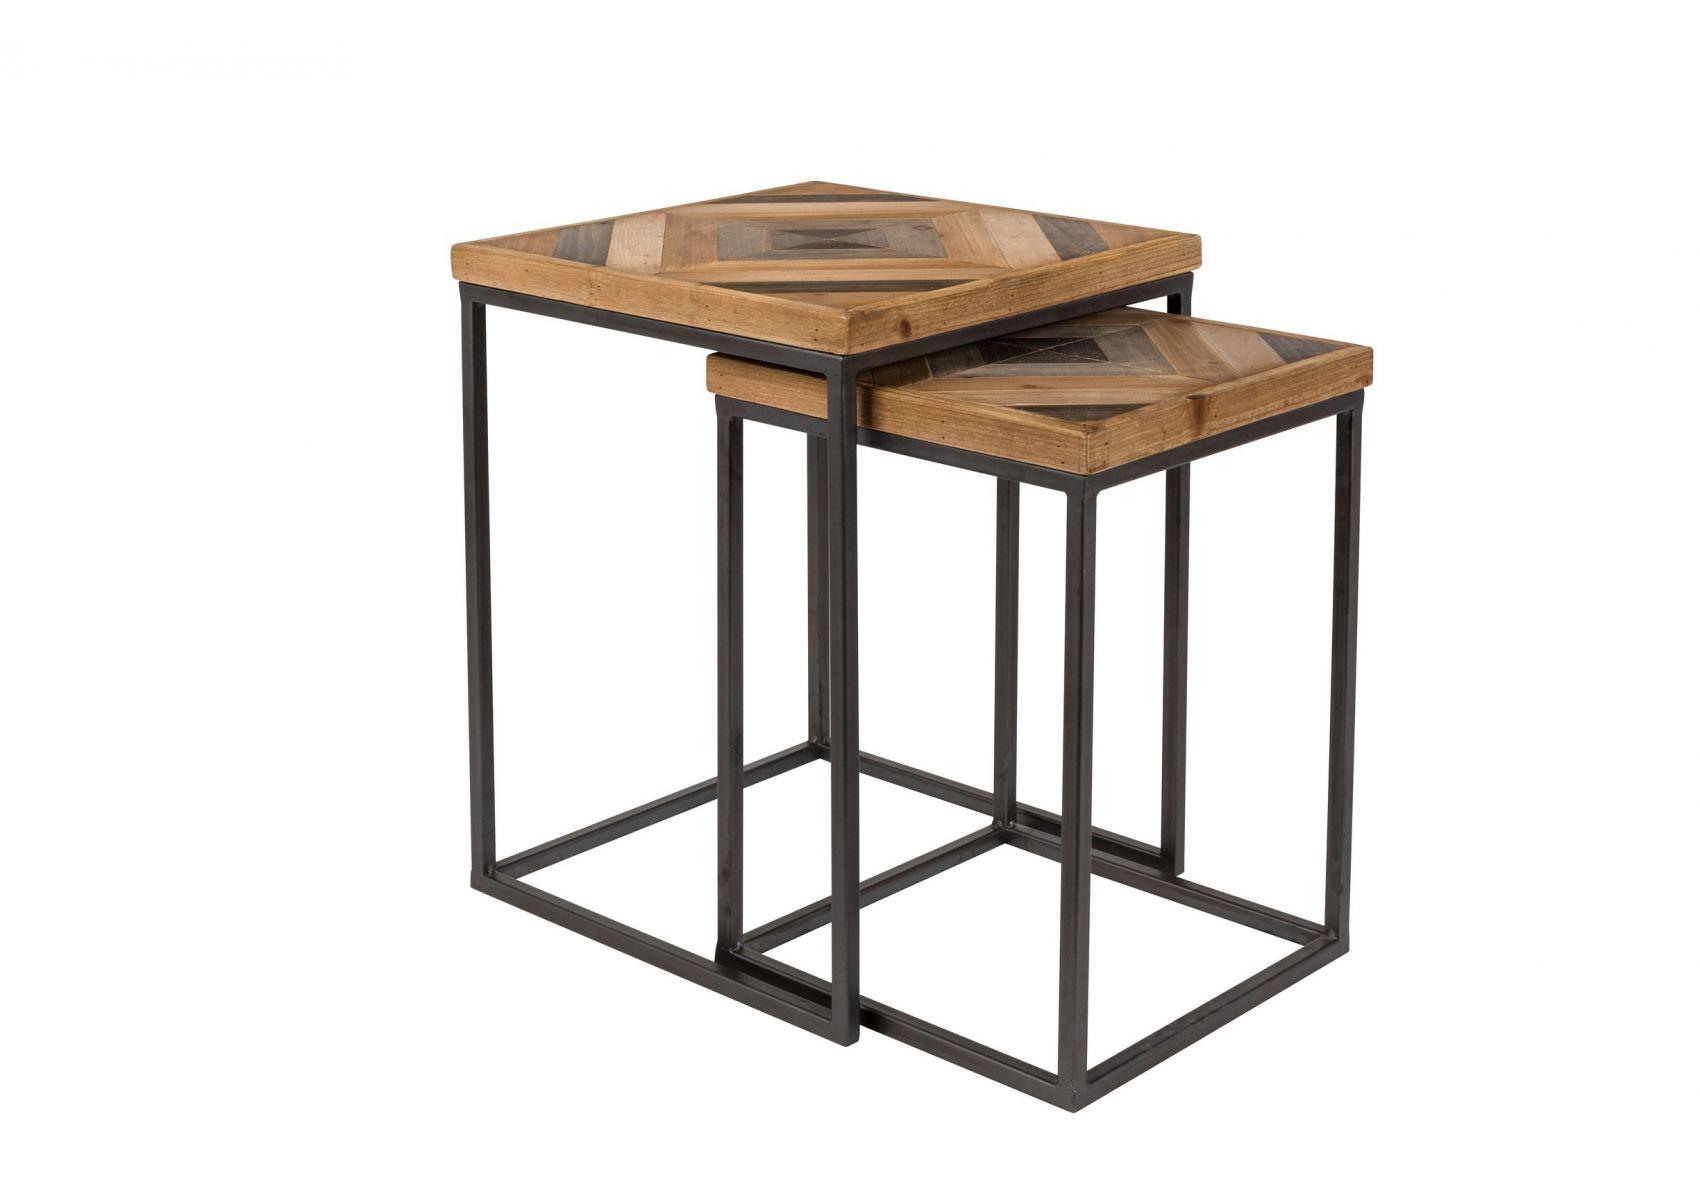 table basse gigogne industrielle bois et m tal joy boite. Black Bedroom Furniture Sets. Home Design Ideas